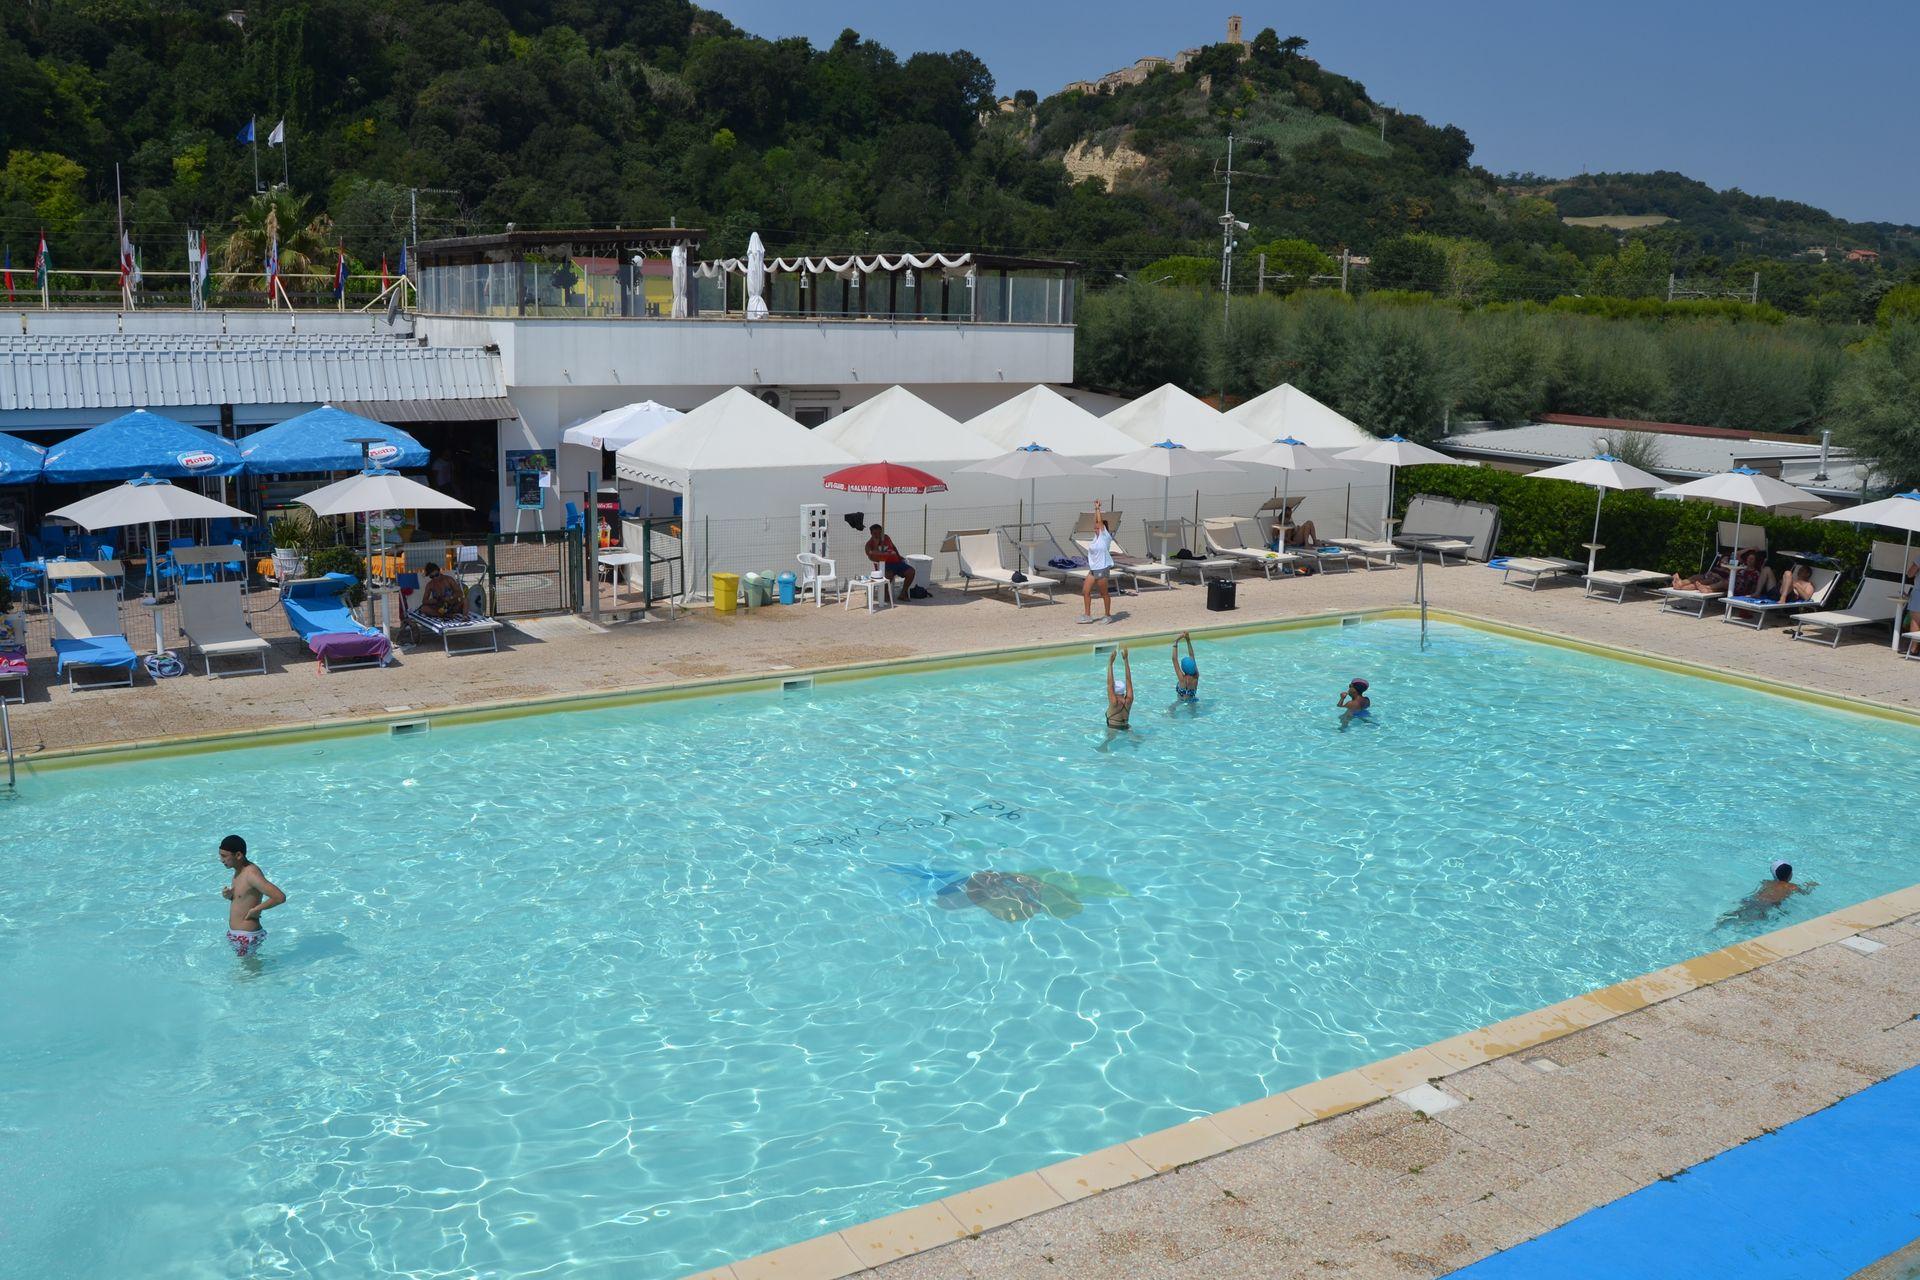 Girasole camping village camping 4 stelle fermo marche campeggi con piscina marche - Campeggi con piscina marche ...